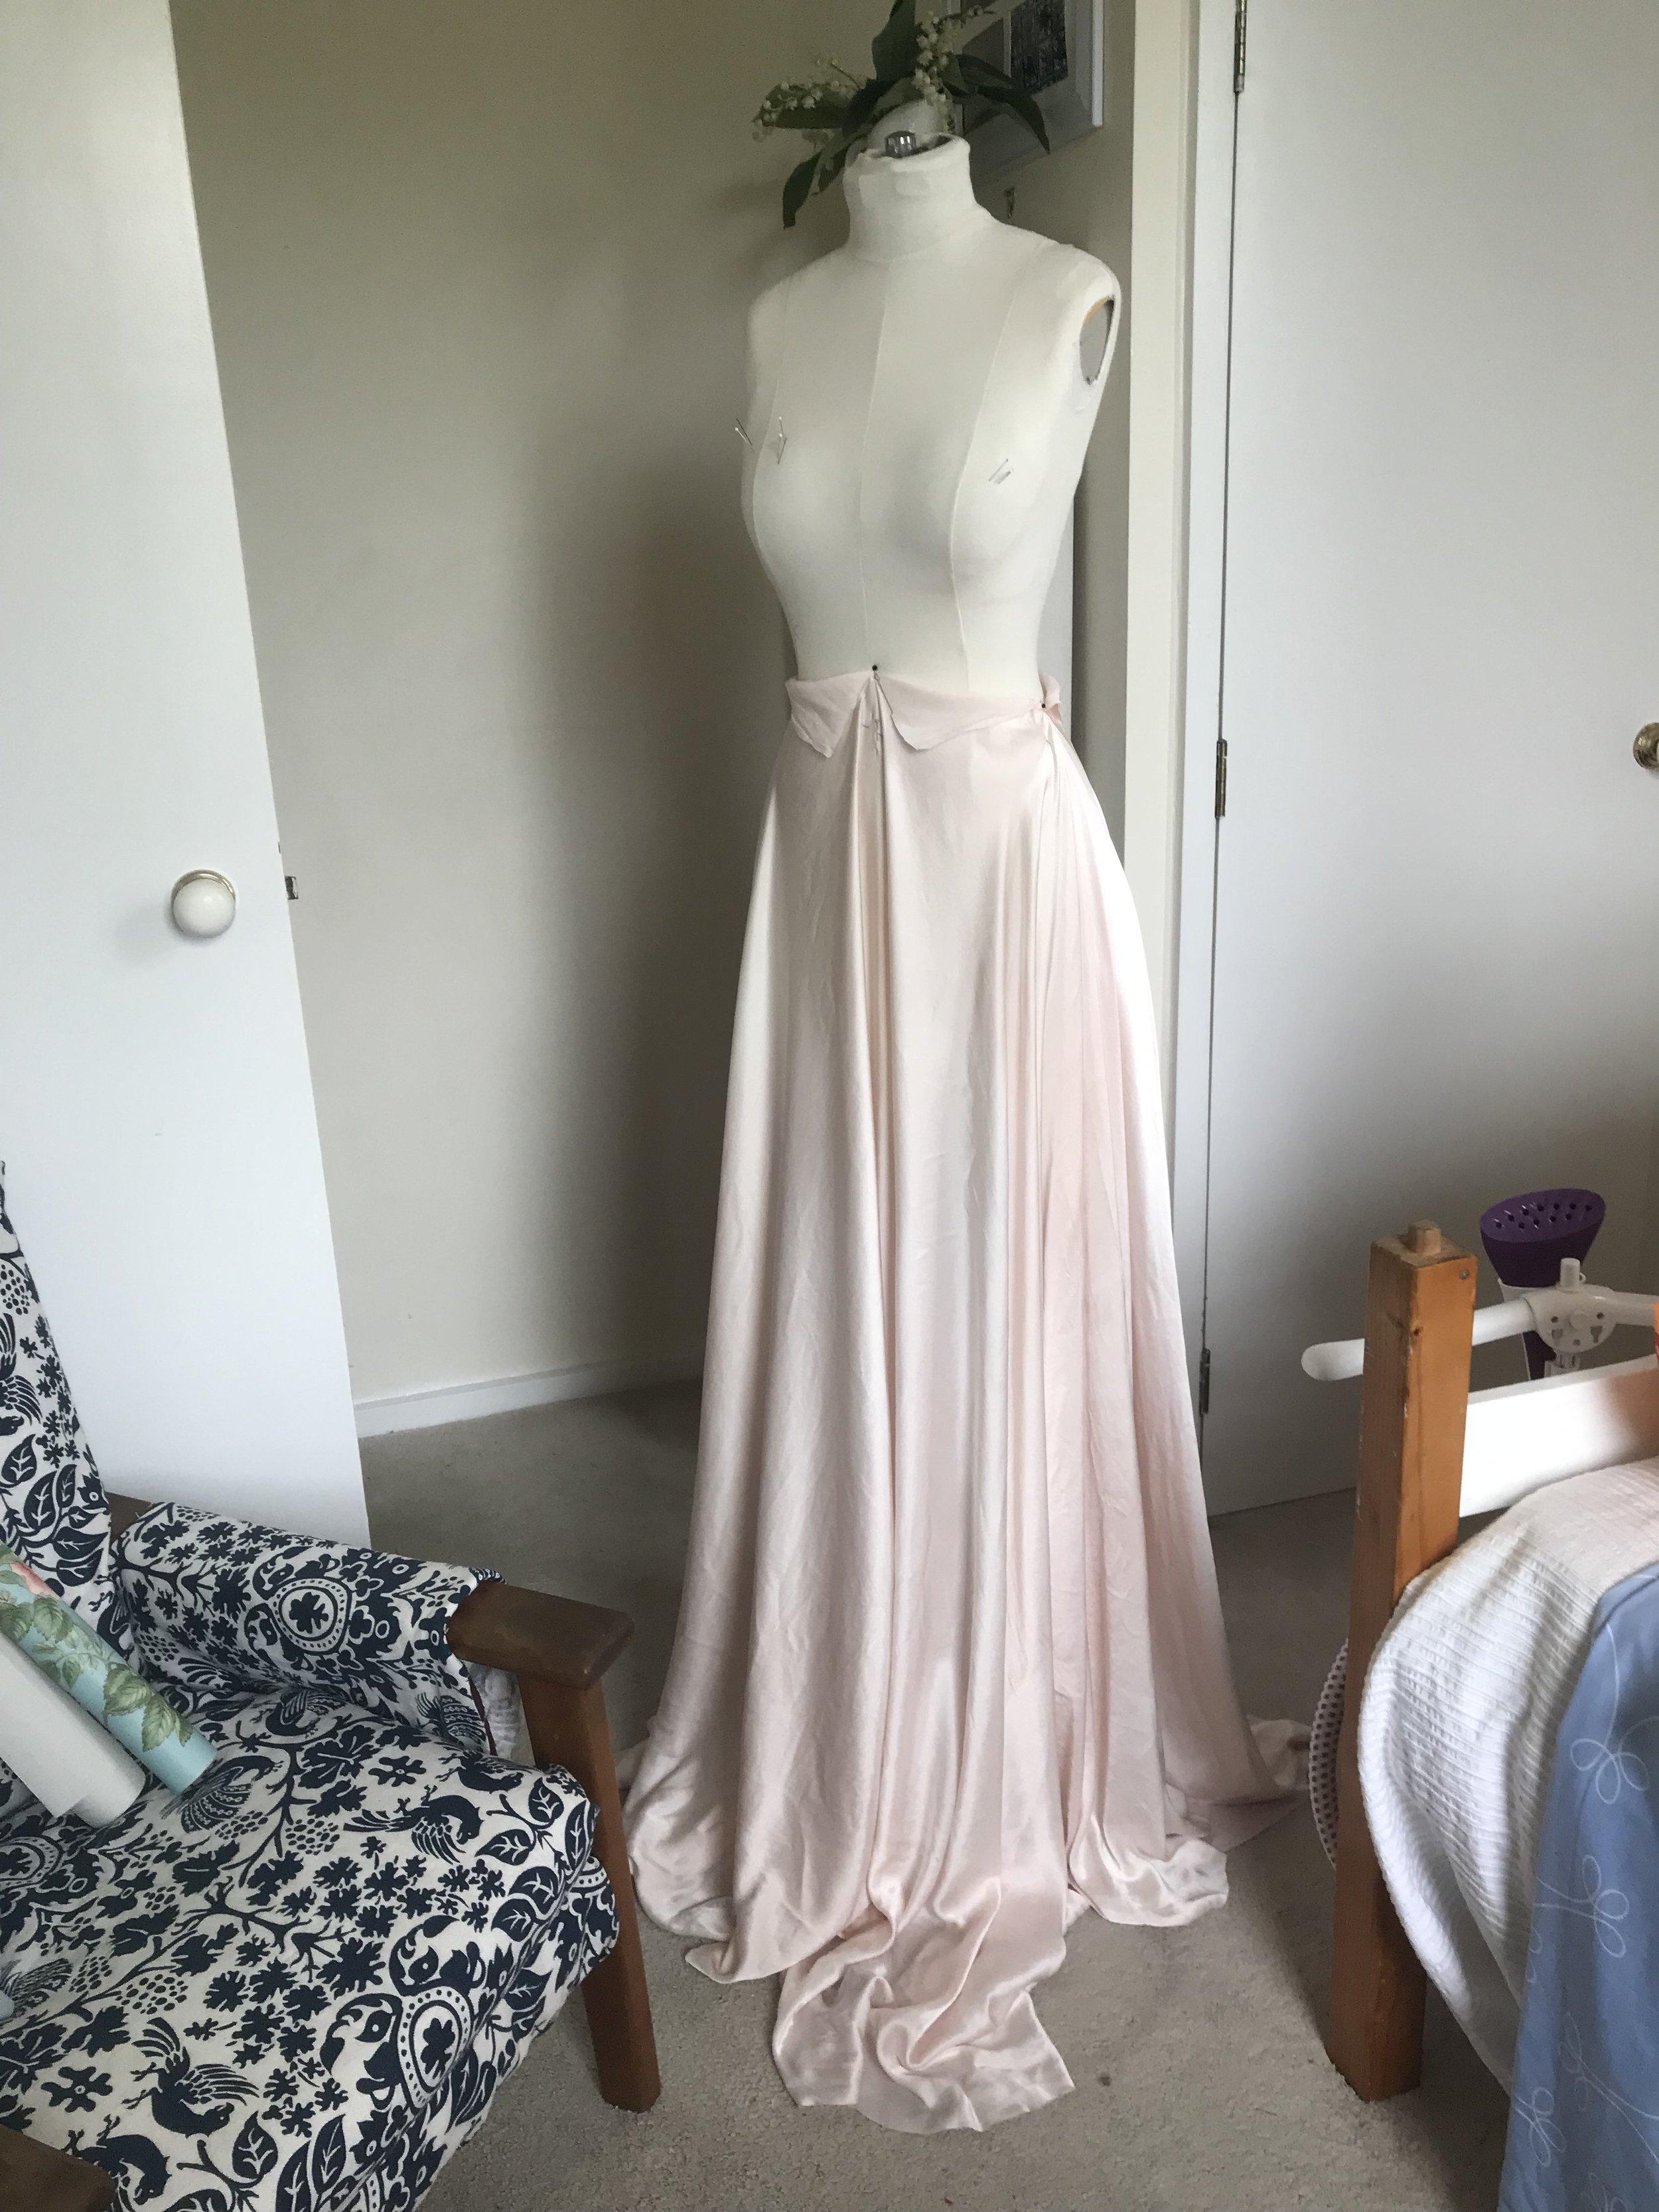 Skirt Layer 1: Silk Satin